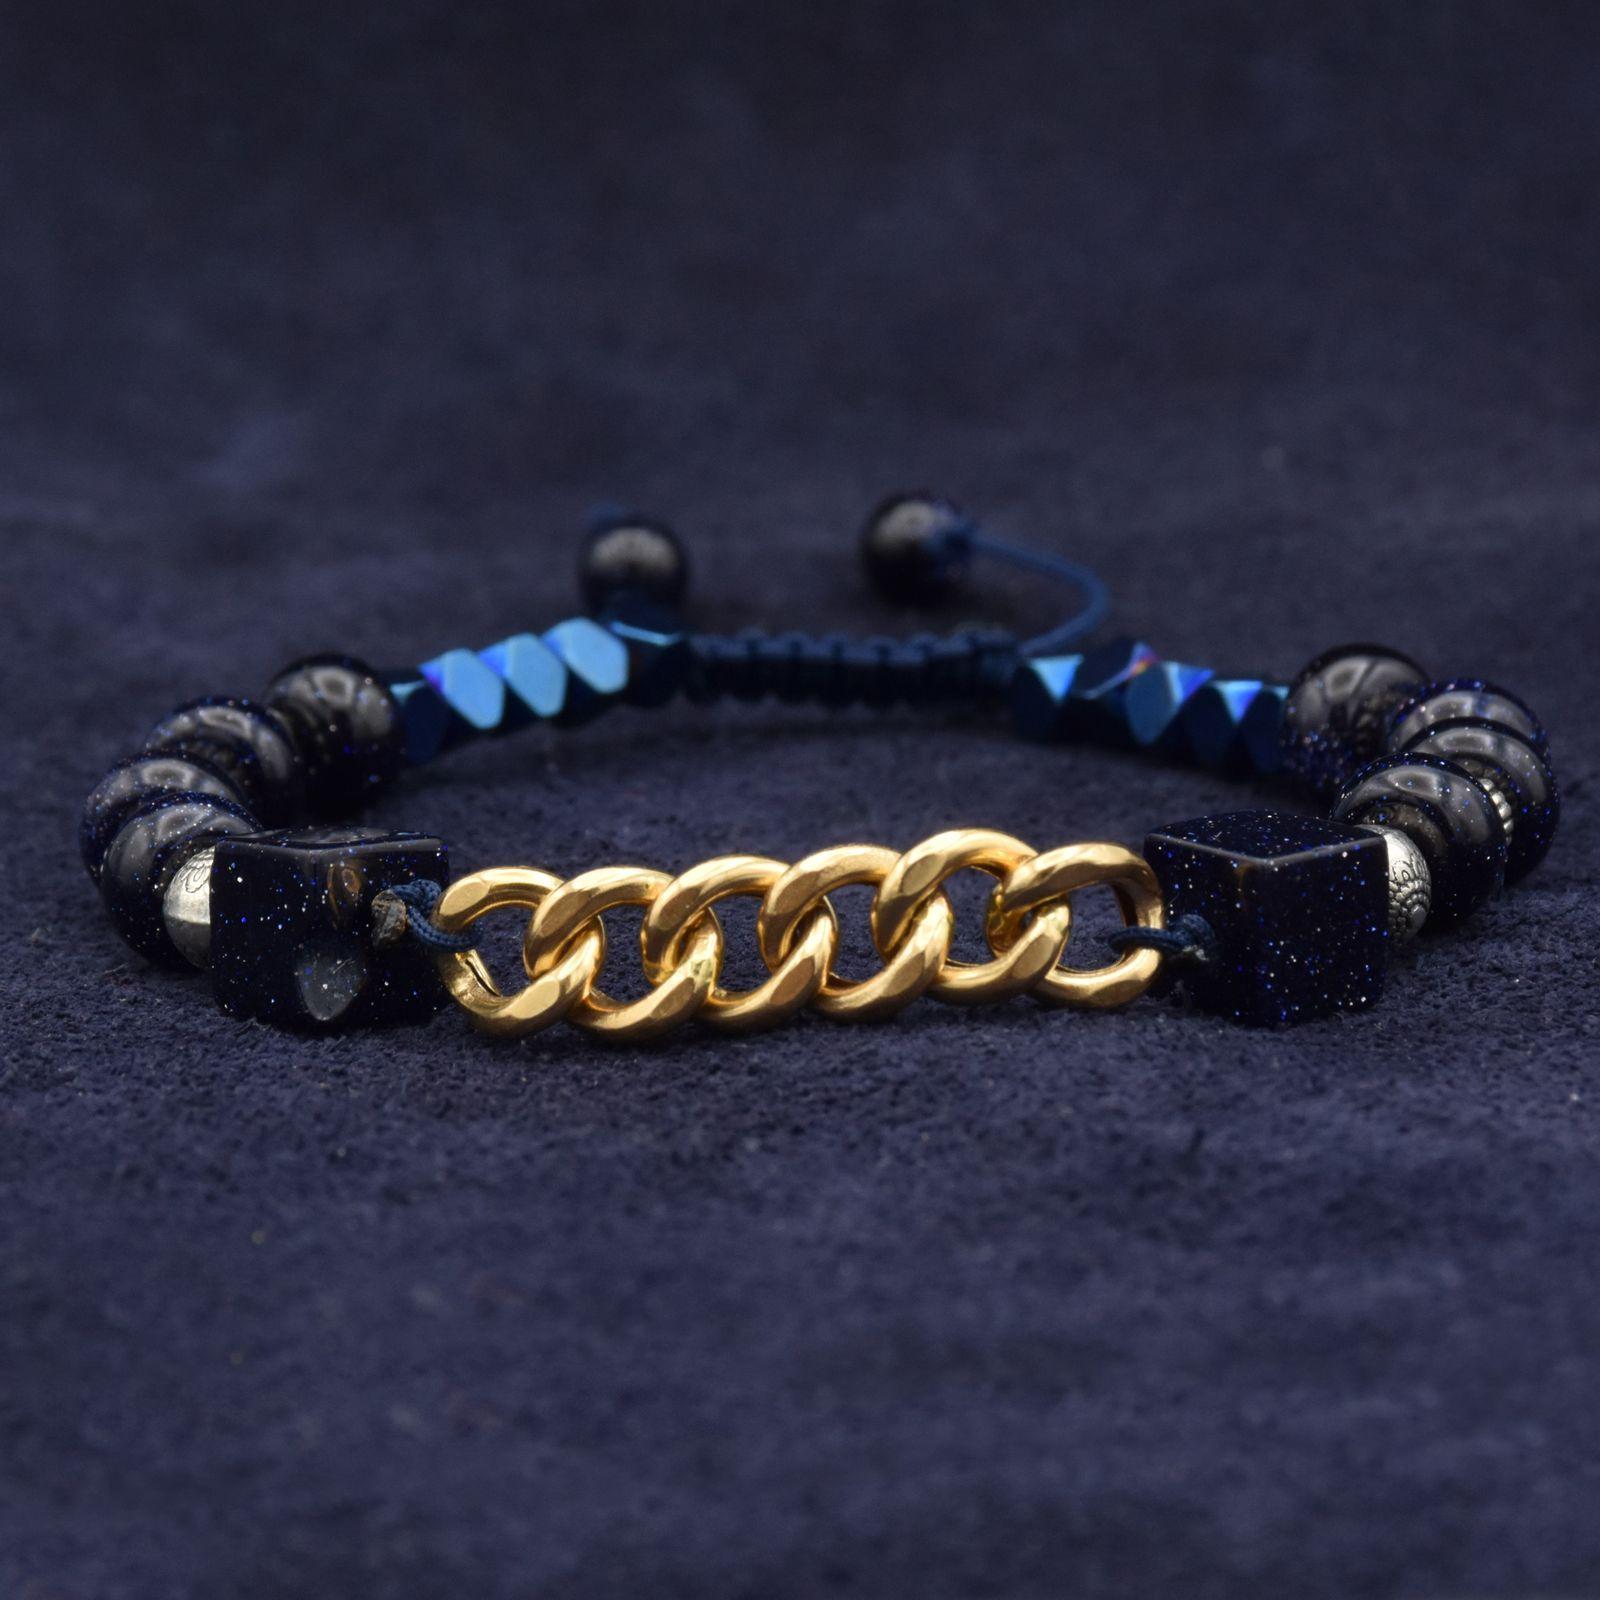 دستبند طلا 18 عیار زنانه آمانژ کد 1006D8951 -  - 4